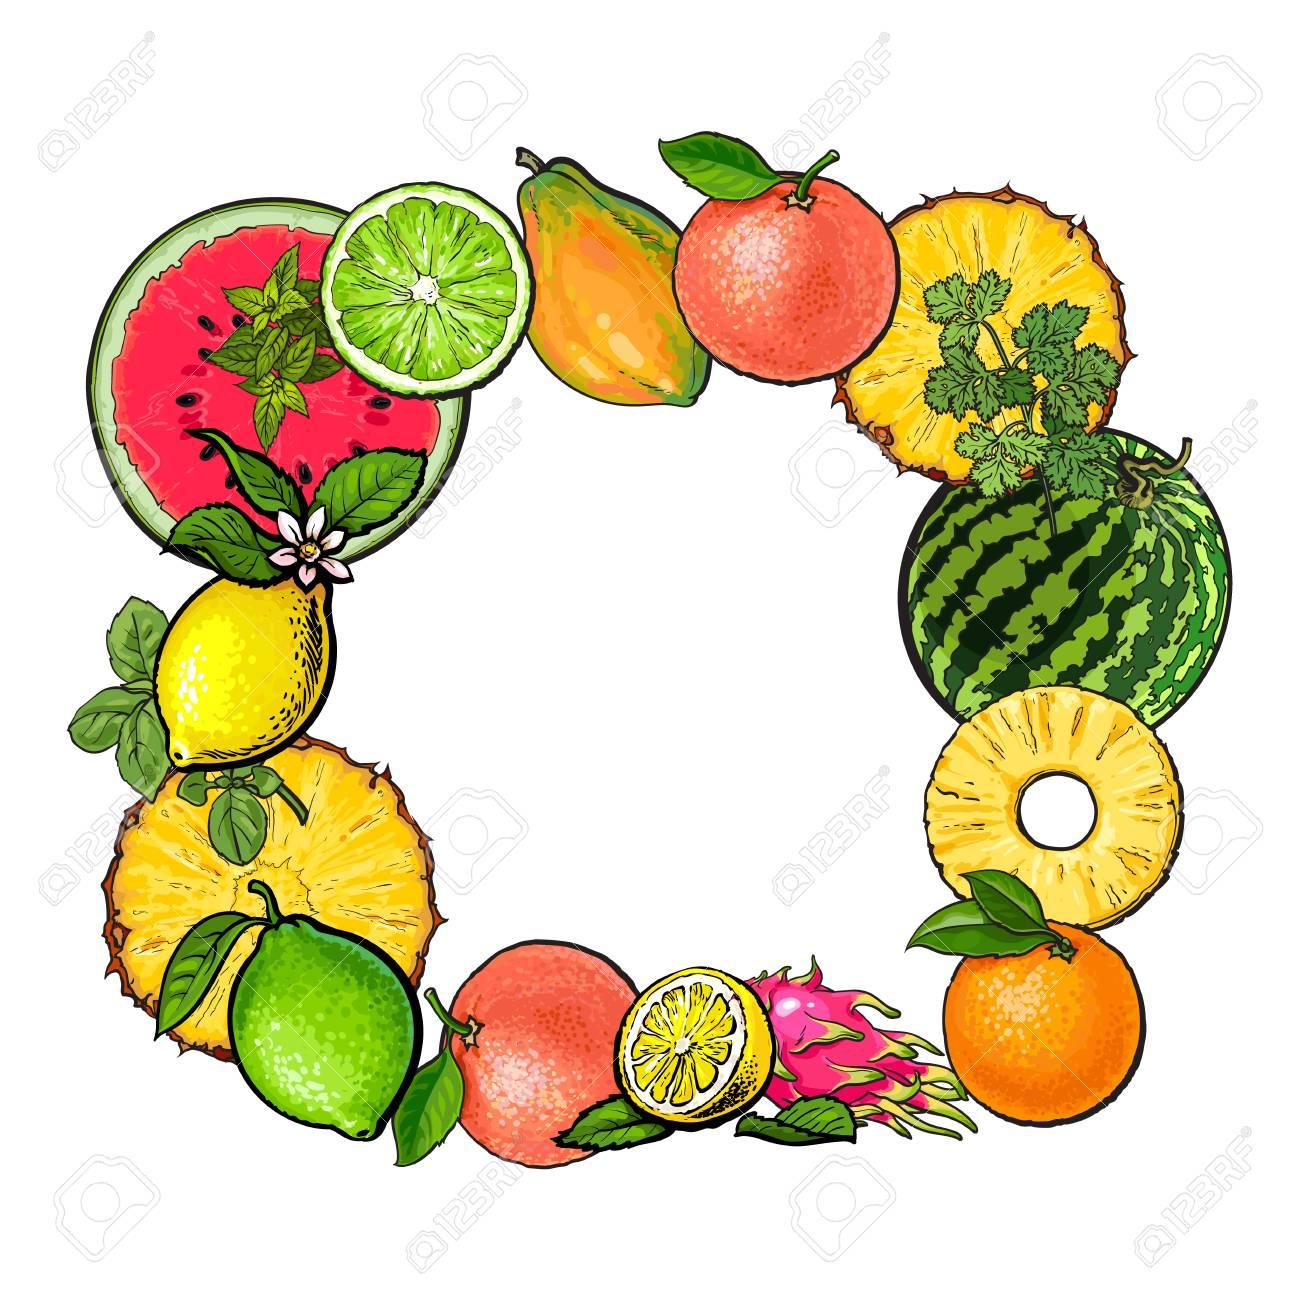 A Fruta Carambola Serve Para Que stock illustration